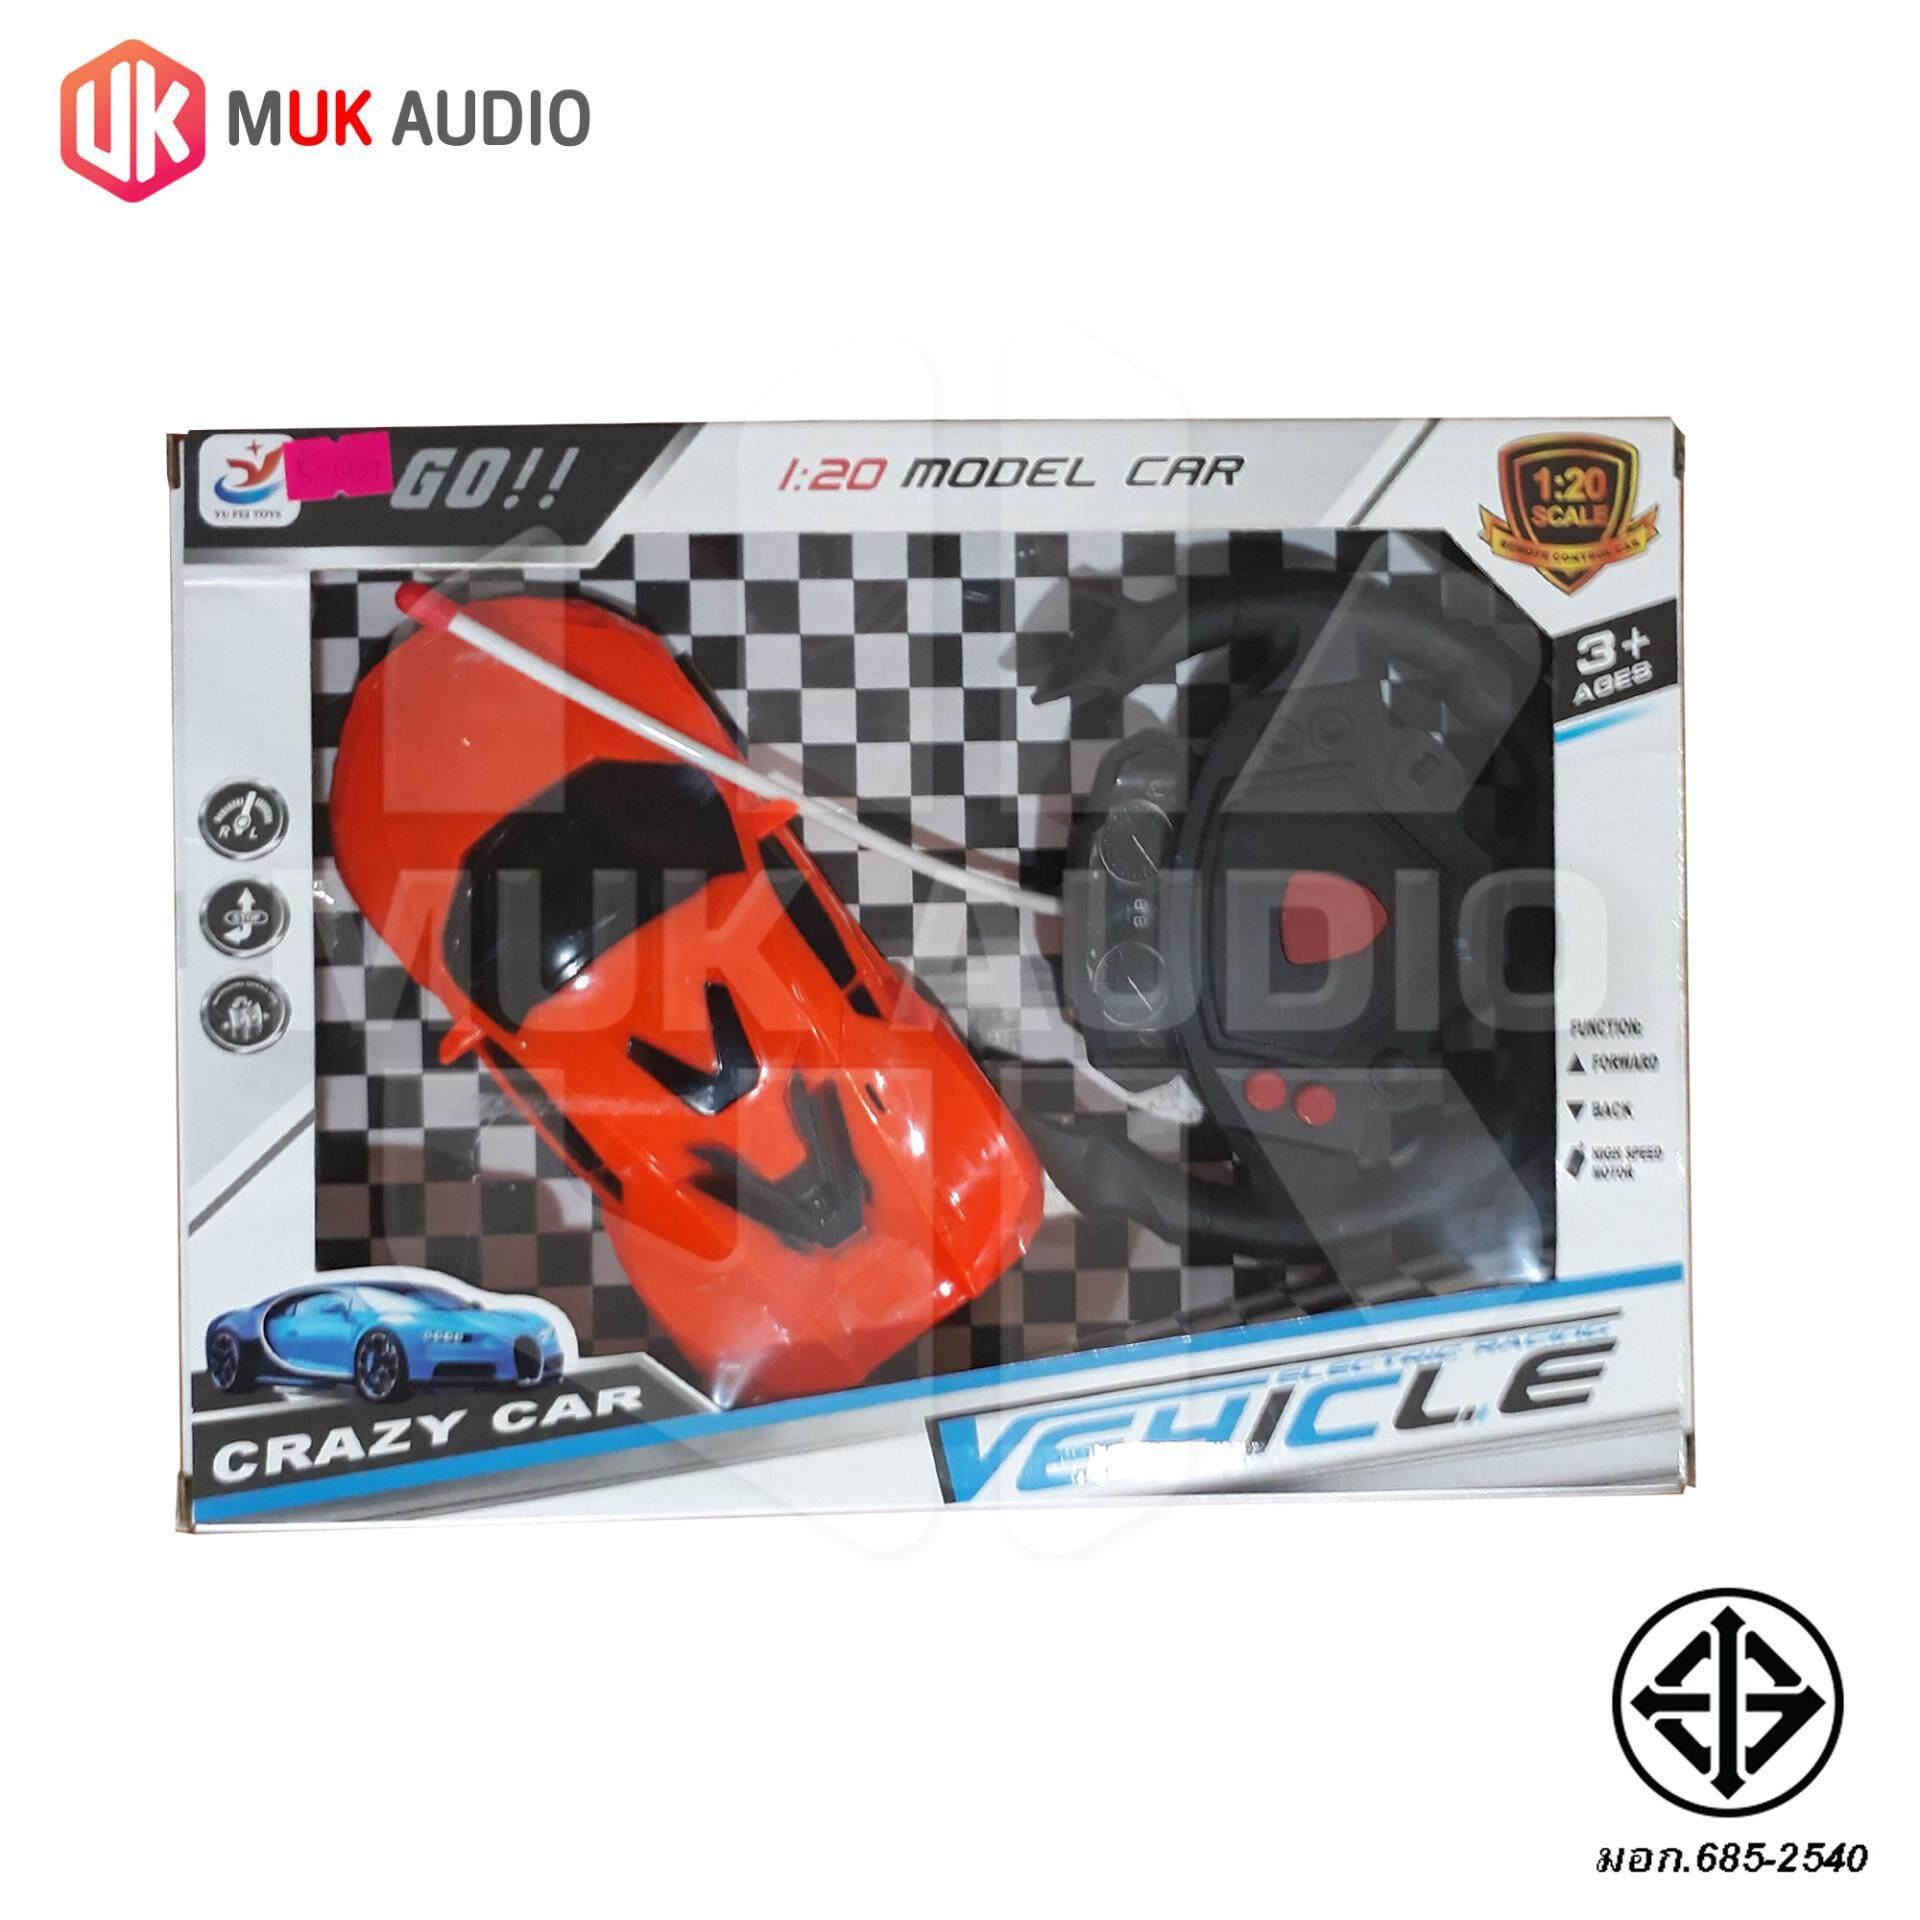 Toys 5007o รถสปอร์ต บังคับ สีส้ม Crazy Car มี รีโมทคอนโทรล วัสดุปลอดภัย มี มอก. ของเล่น Venicle Electric Racing สร้างเสริมจินตนาการ The Best Gifts For Children Funny Toy Knead Your Interesting Childhood Its A Magical World Lets Play Together By Mukaudio.